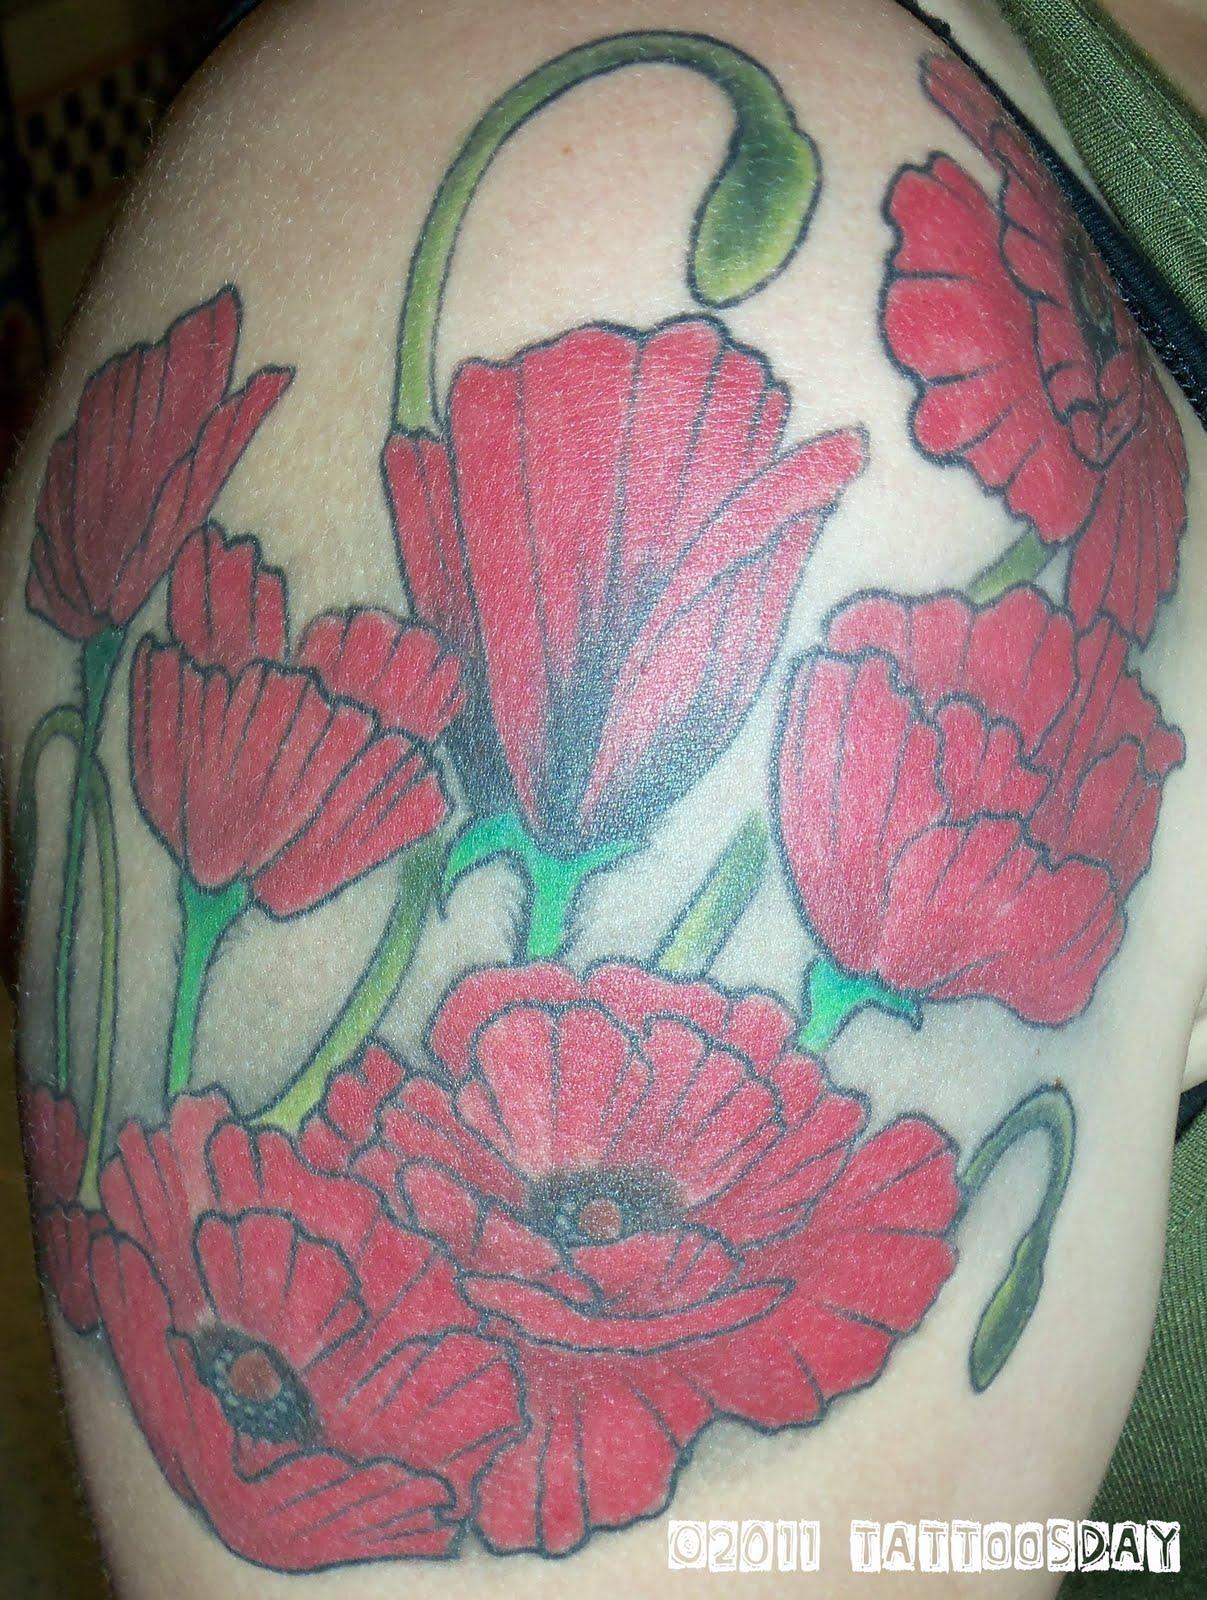 Tattoosday A Tattoo Blog Poppies For Poppy